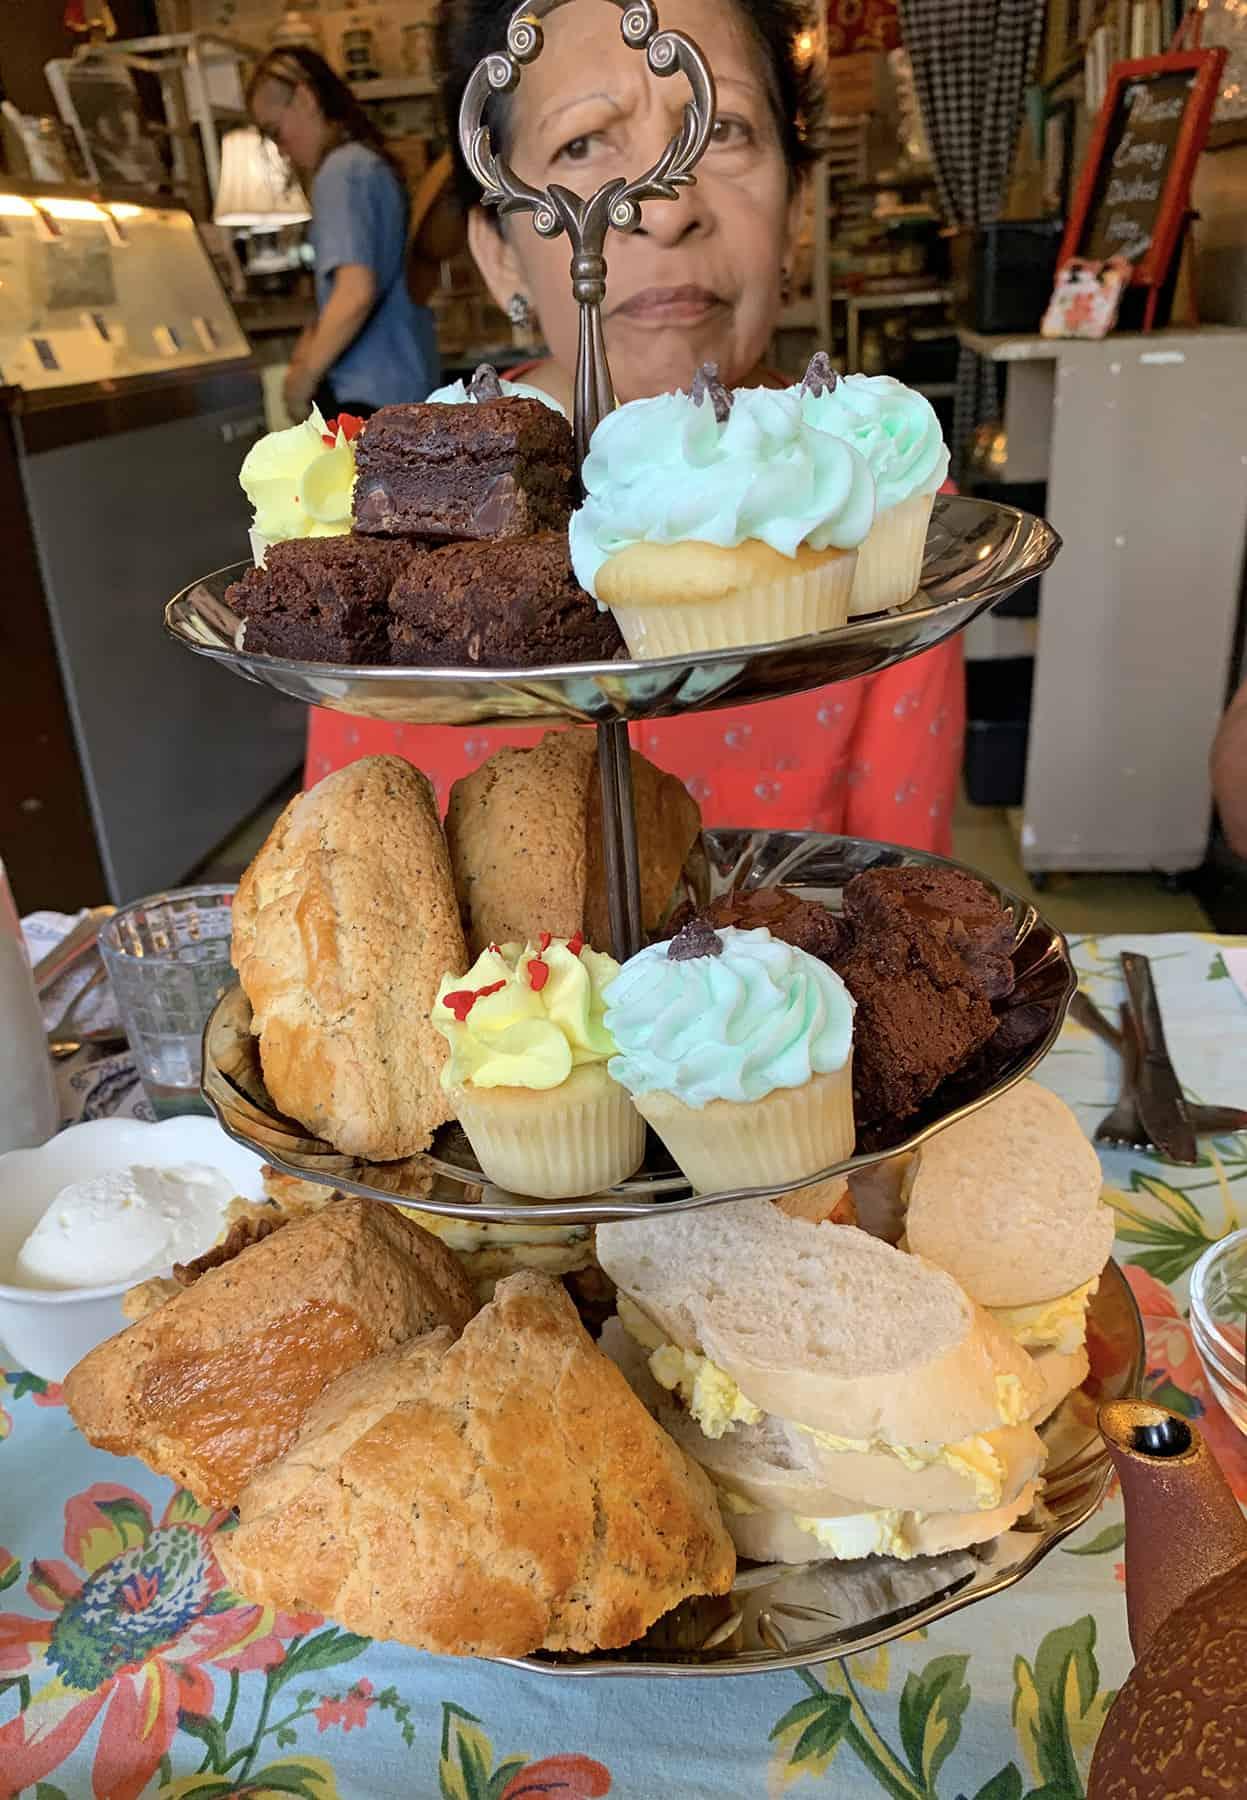 Dr. Bombays Underwater Tea Party Lemon Scones on Afternoon Tea Tray